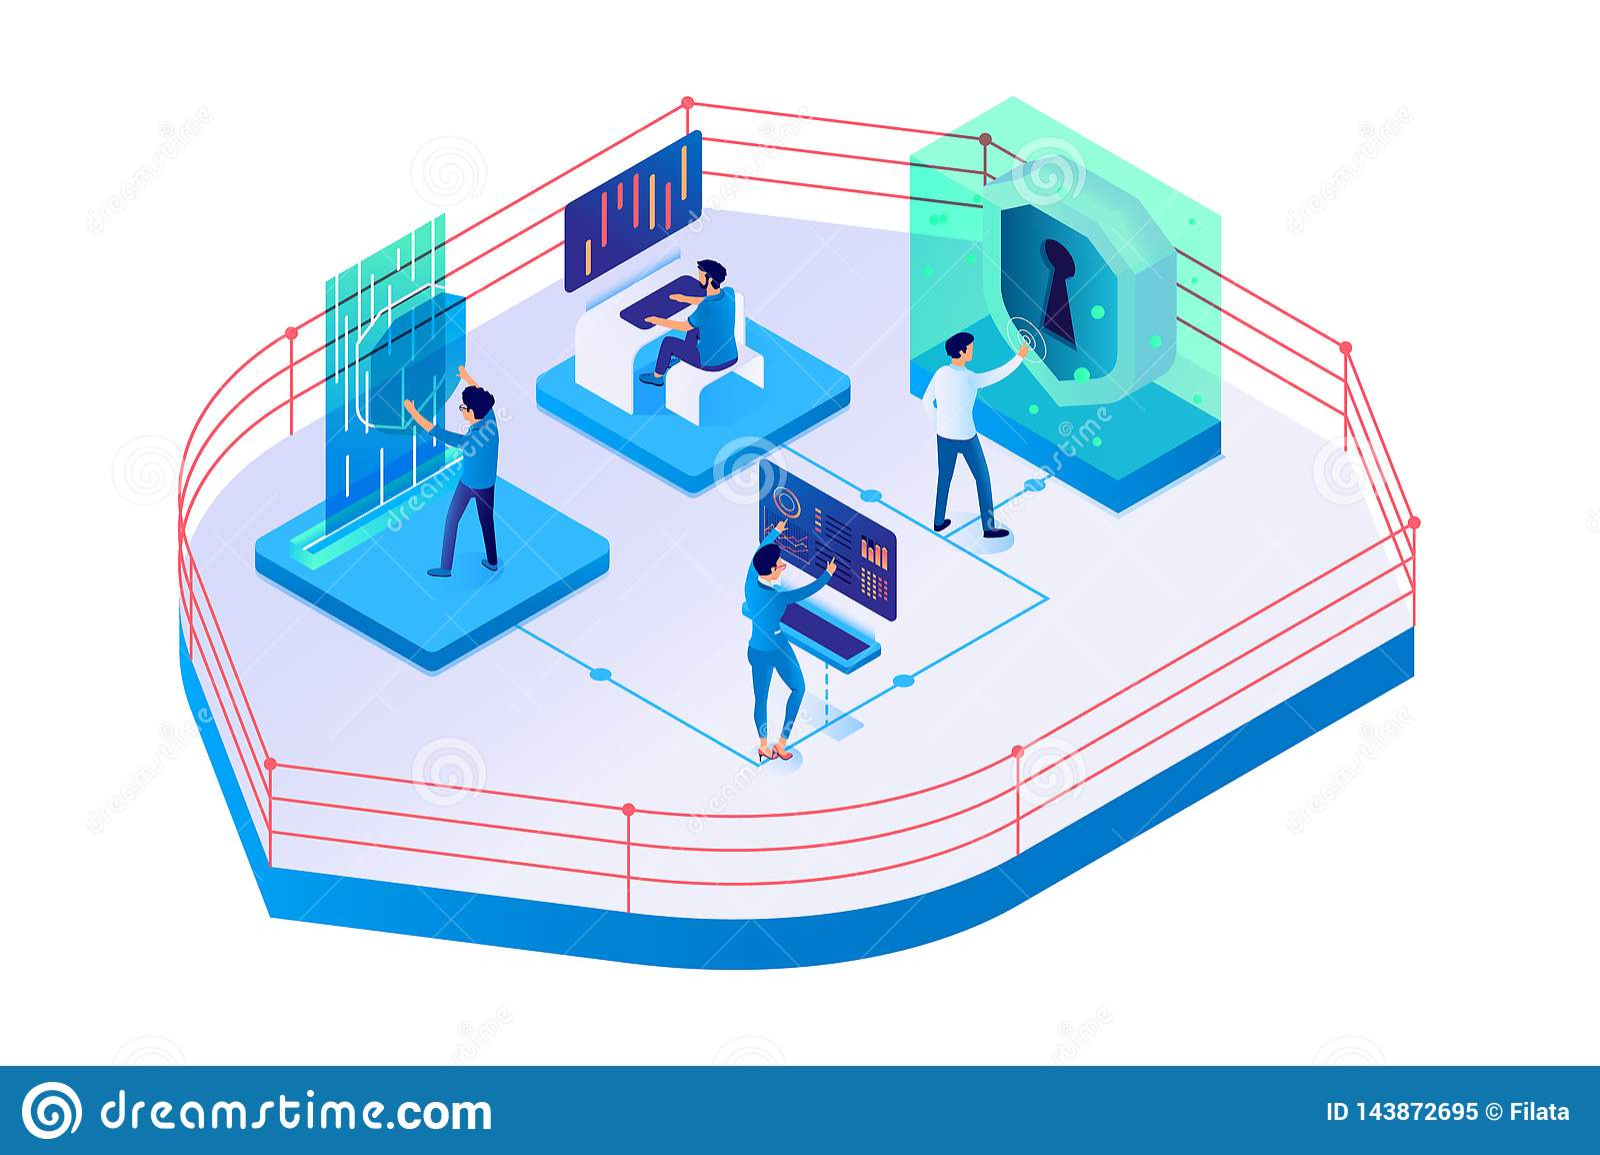 3d isometric biznesmen, bizneswoman na system ochronie i